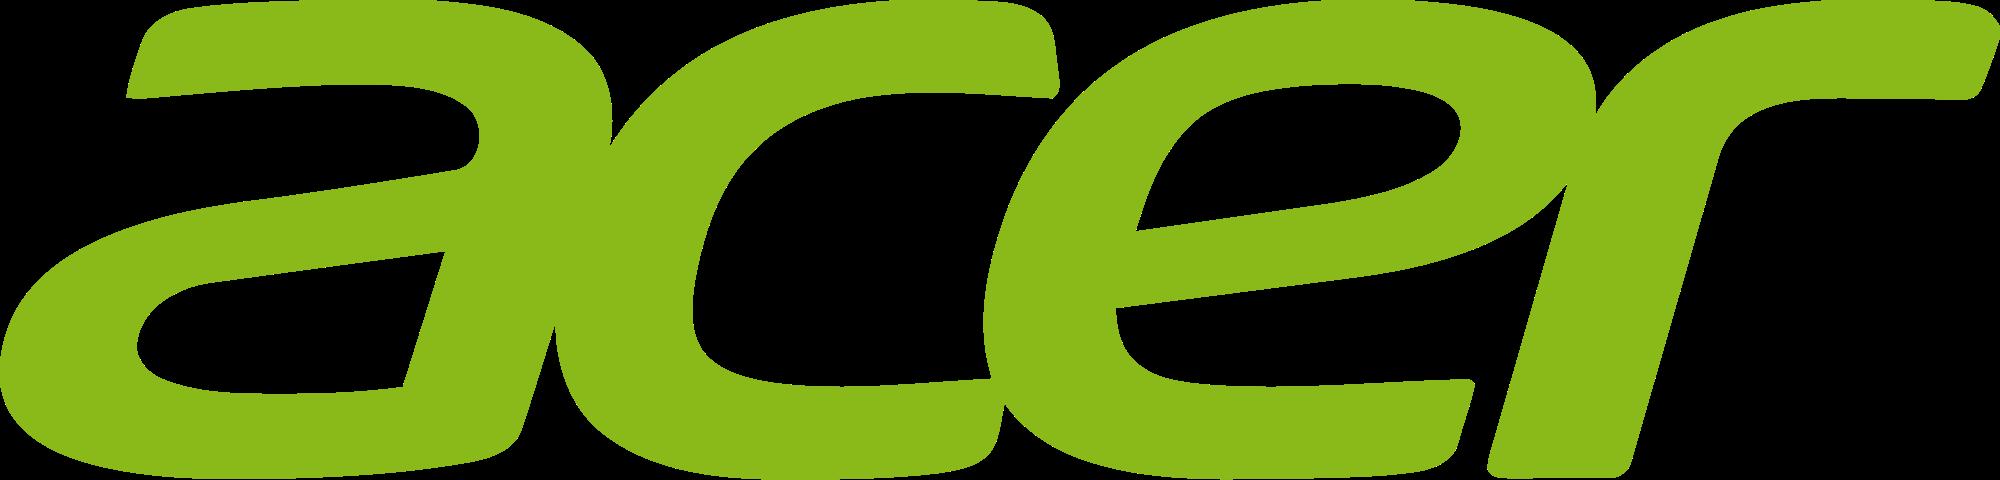 Acer Service center in vasundhara enclave noida